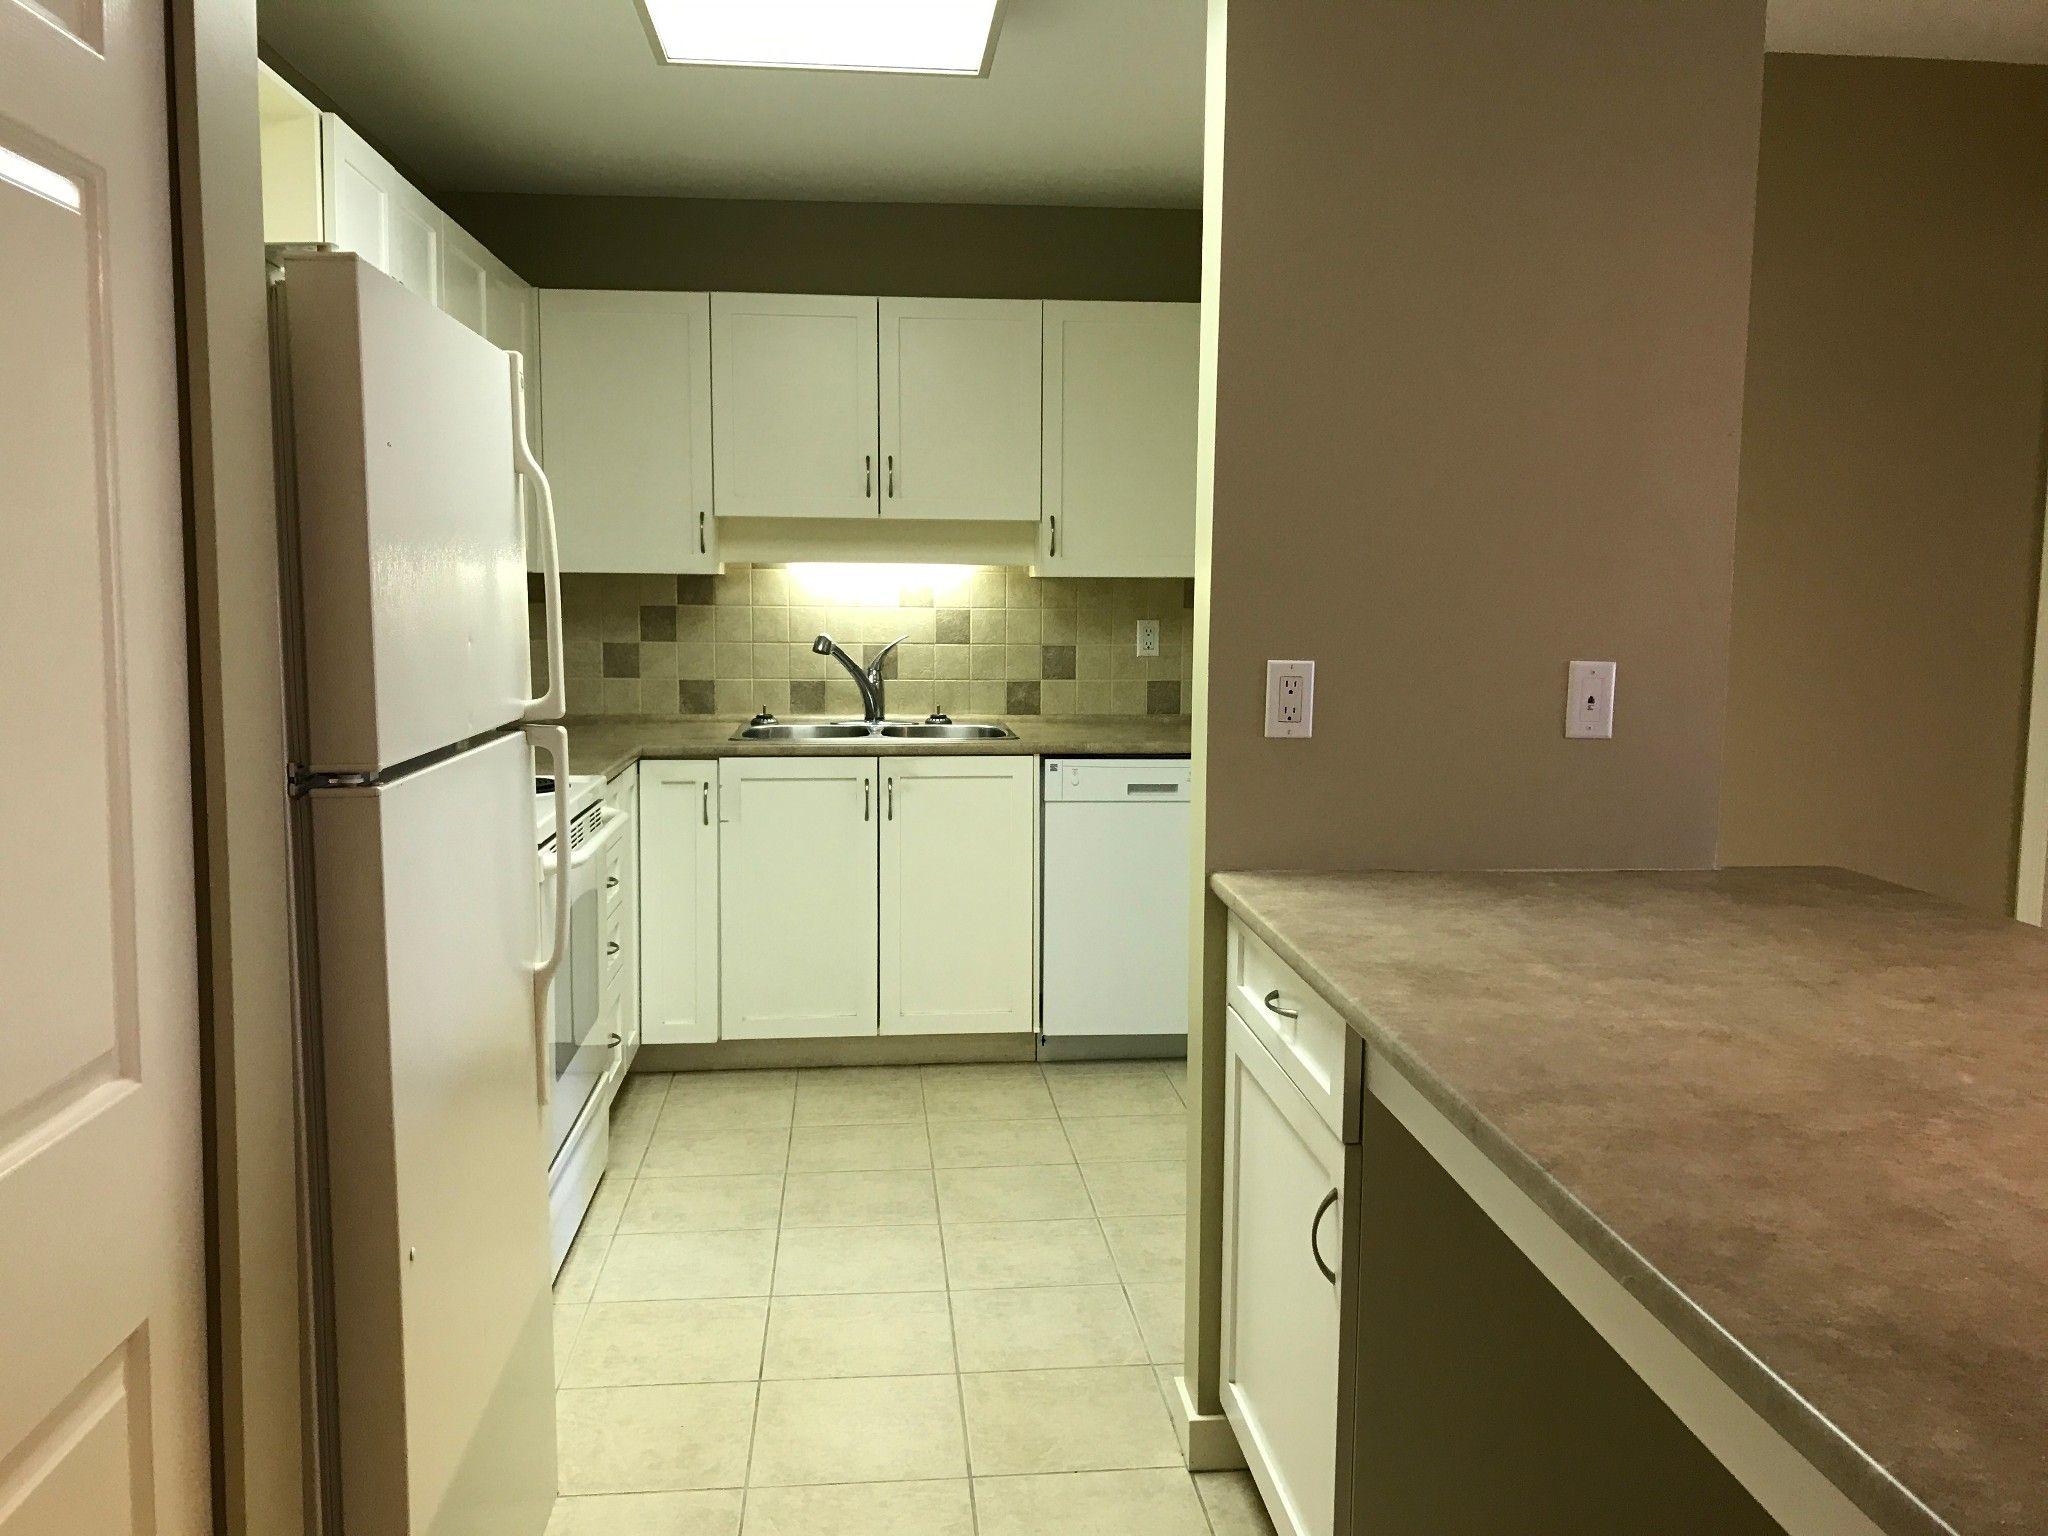 Photo 8: Photos: #329 2700 McCallum Rd. in Abbotsford: Central Abbotsford Condo for rent